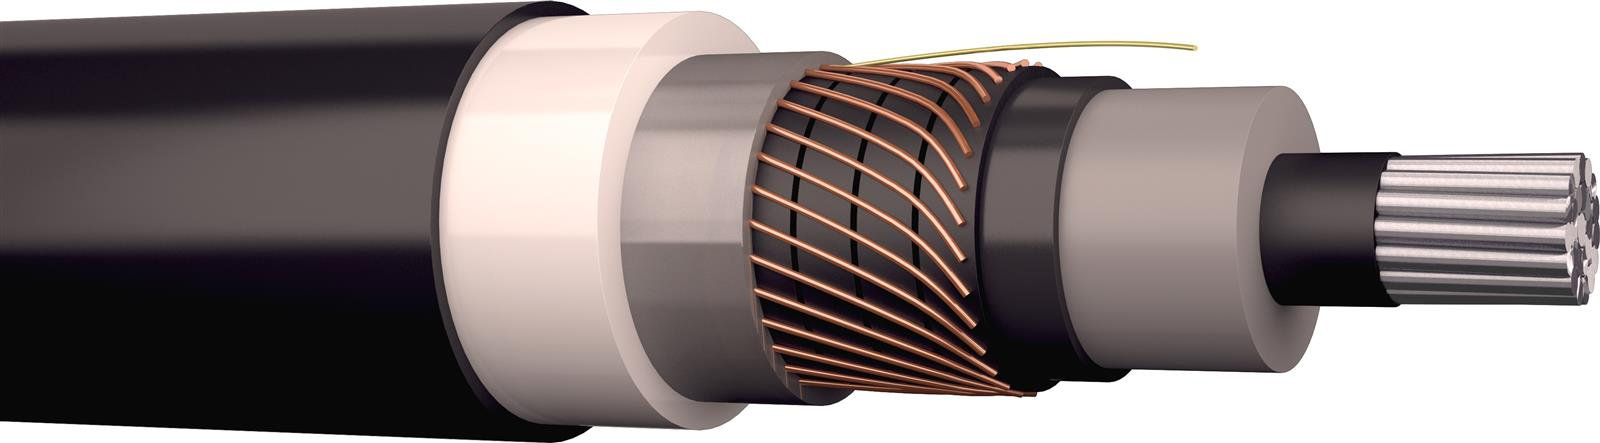 AXLJ-TTCL 1X50/16 24KV T500